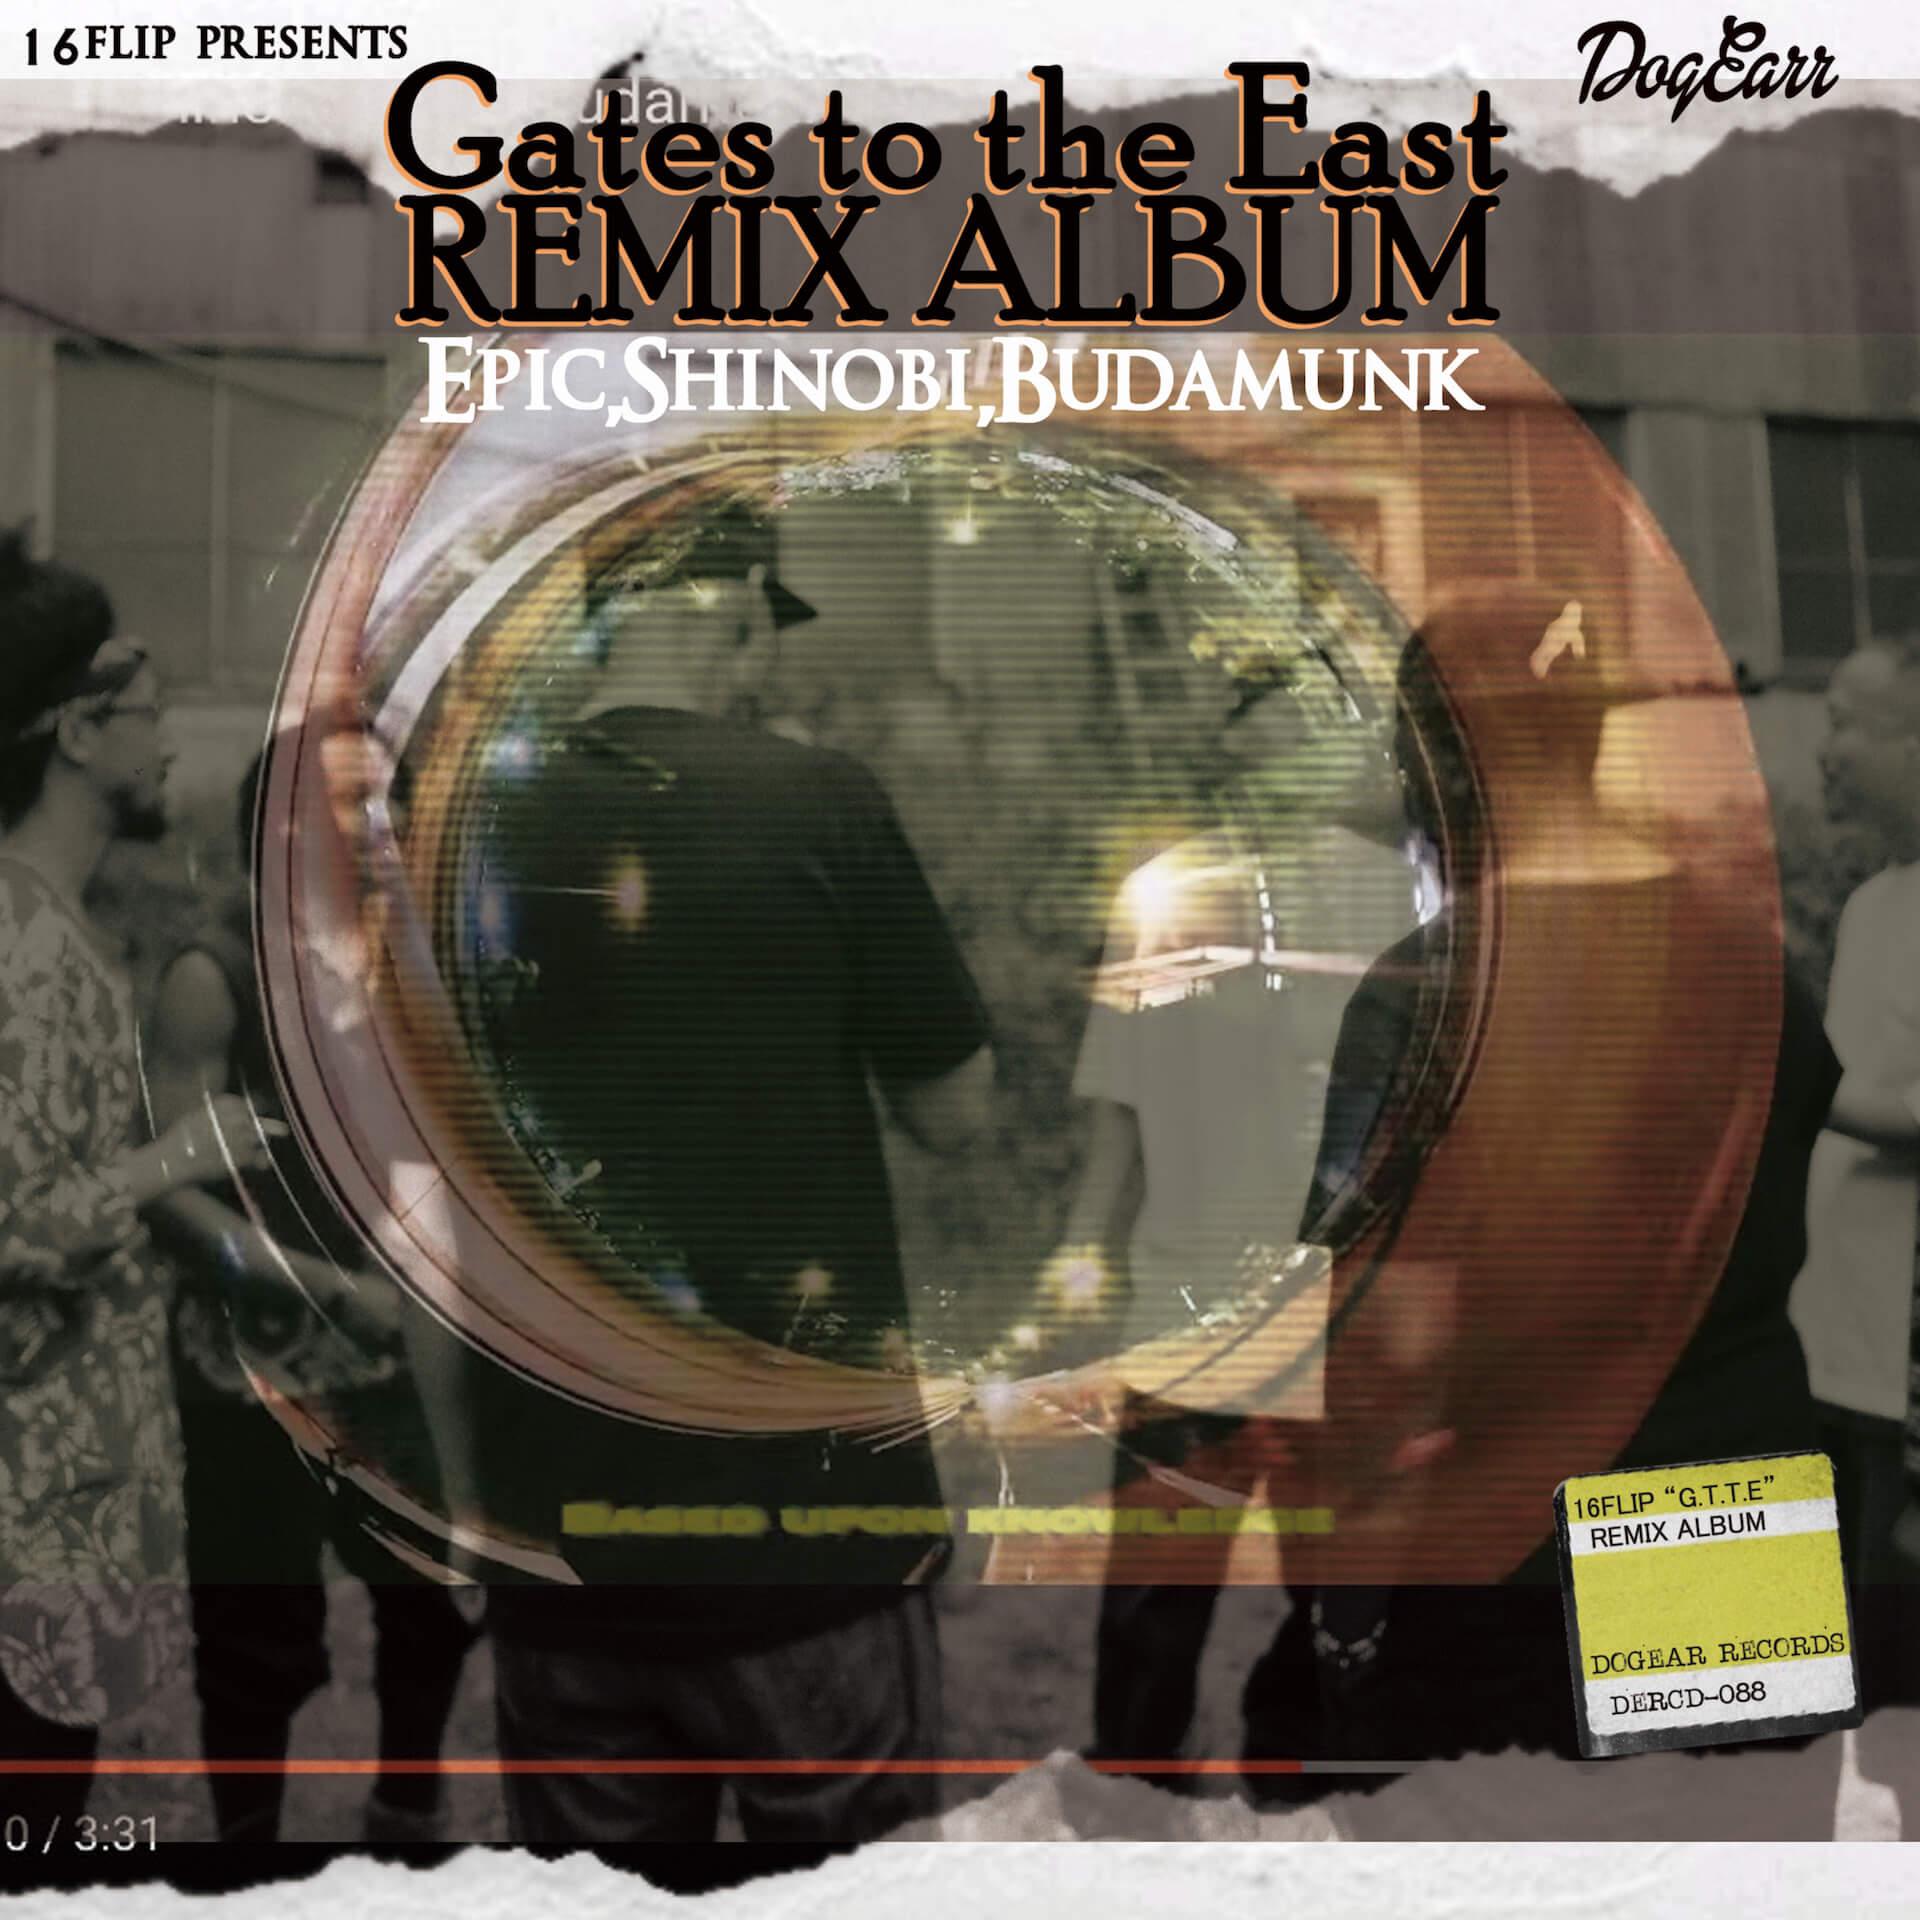 Budamunk、Epic、Shinobiによる名盤『Gates to the East』のRemix盤が発表 16FLIP、DJ Scratch Niceらが参加 music200420_gatestotheeast_main